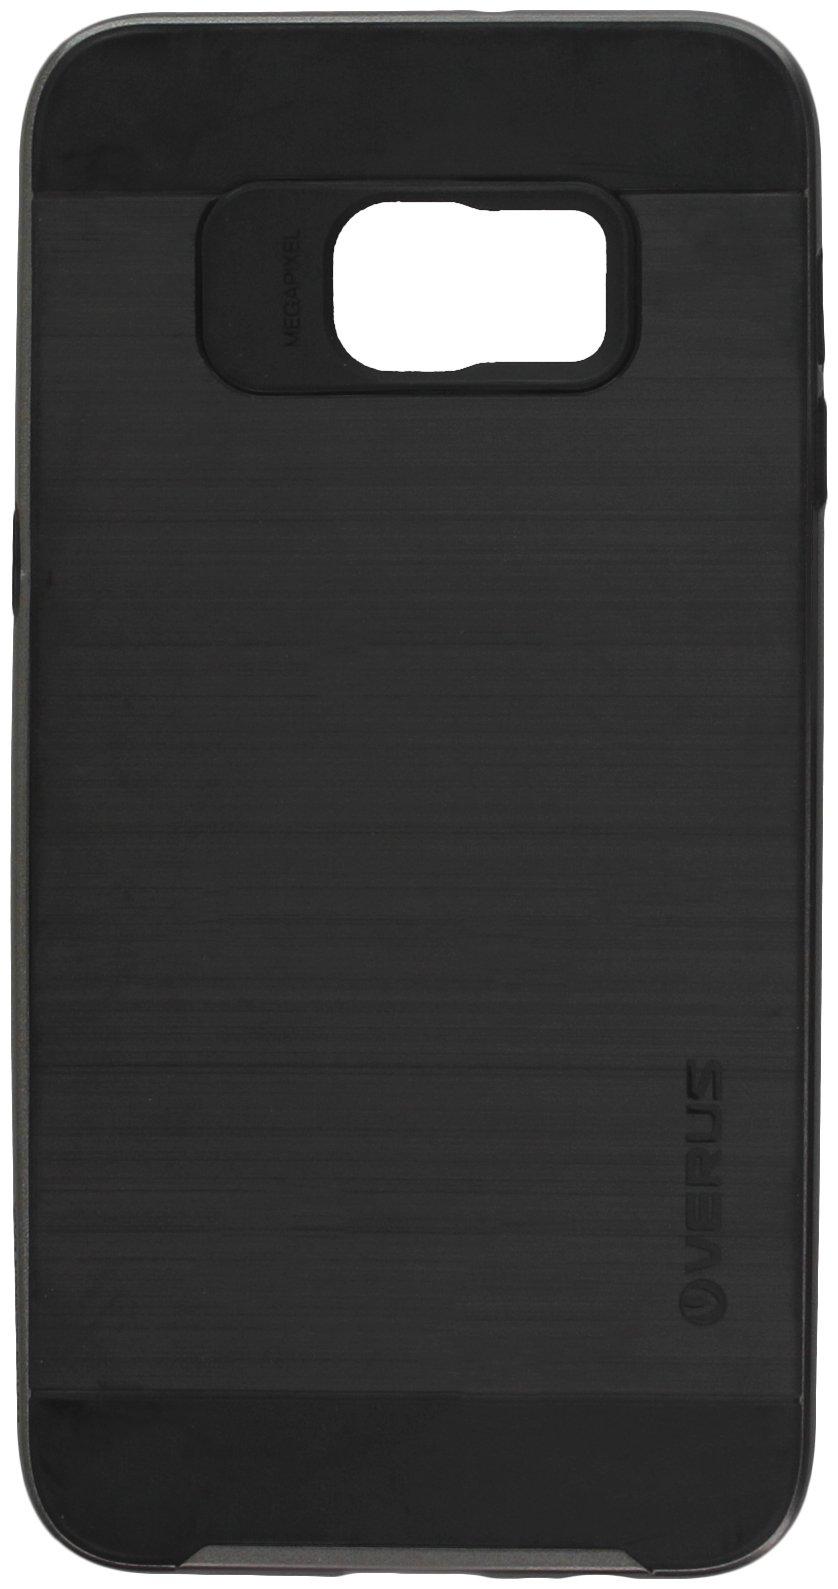 Galaxy S6 Edge Plus Case, Verus [High Pro Shield][Steel Silver] - [Military Grade Protection][Slim Fit] For Samsung S6 Edge+